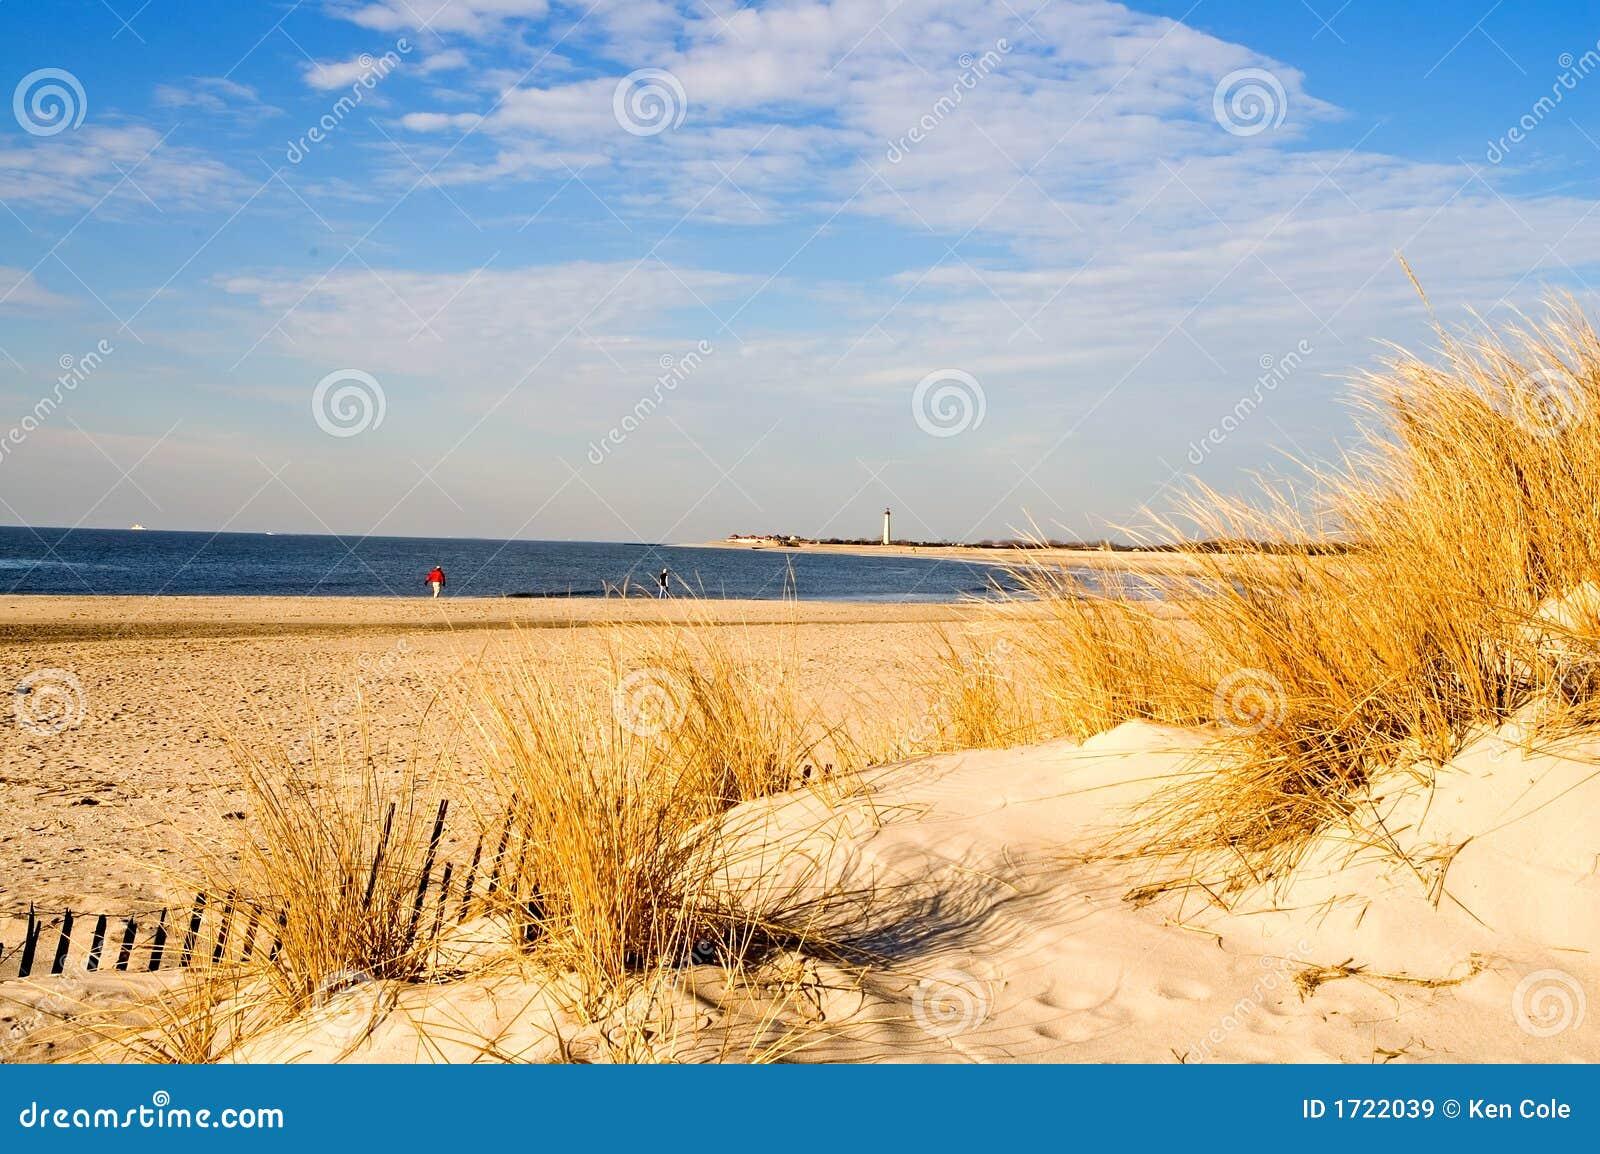 Winter Morning at the Shore